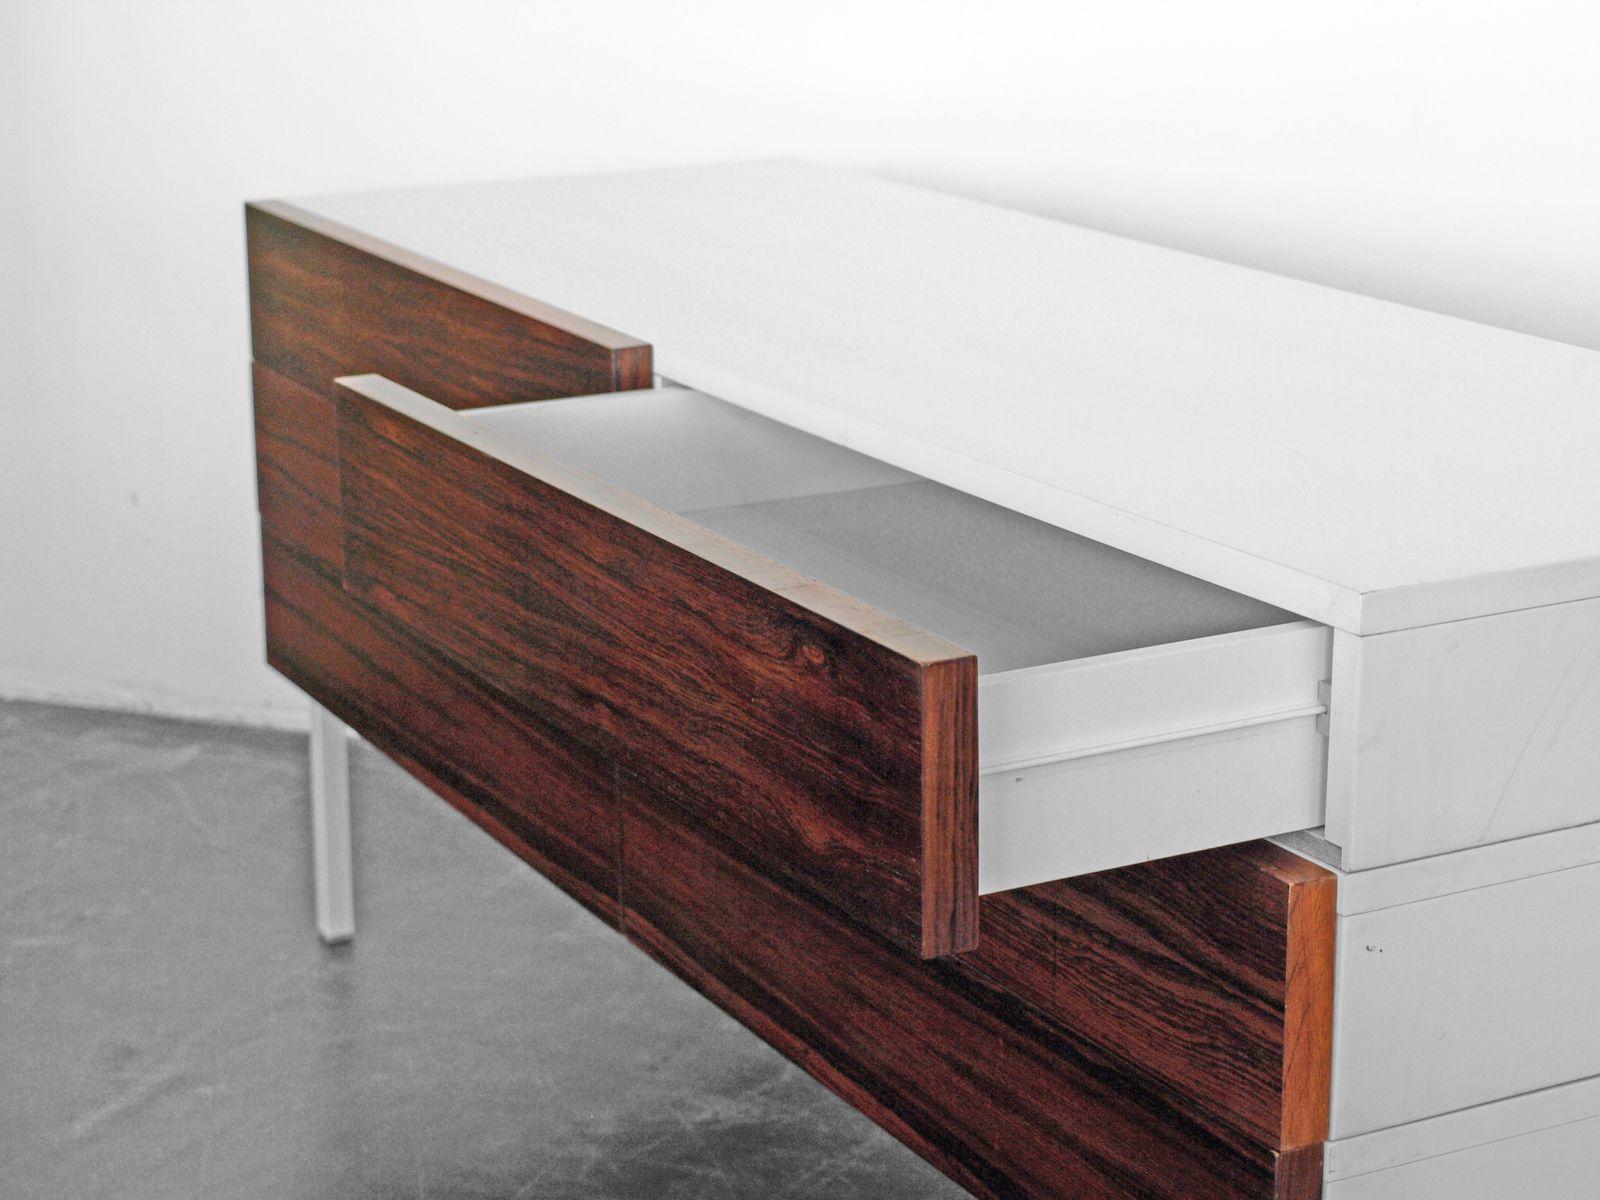 vintage sideboard aus rio palisander von interl bke. Black Bedroom Furniture Sets. Home Design Ideas